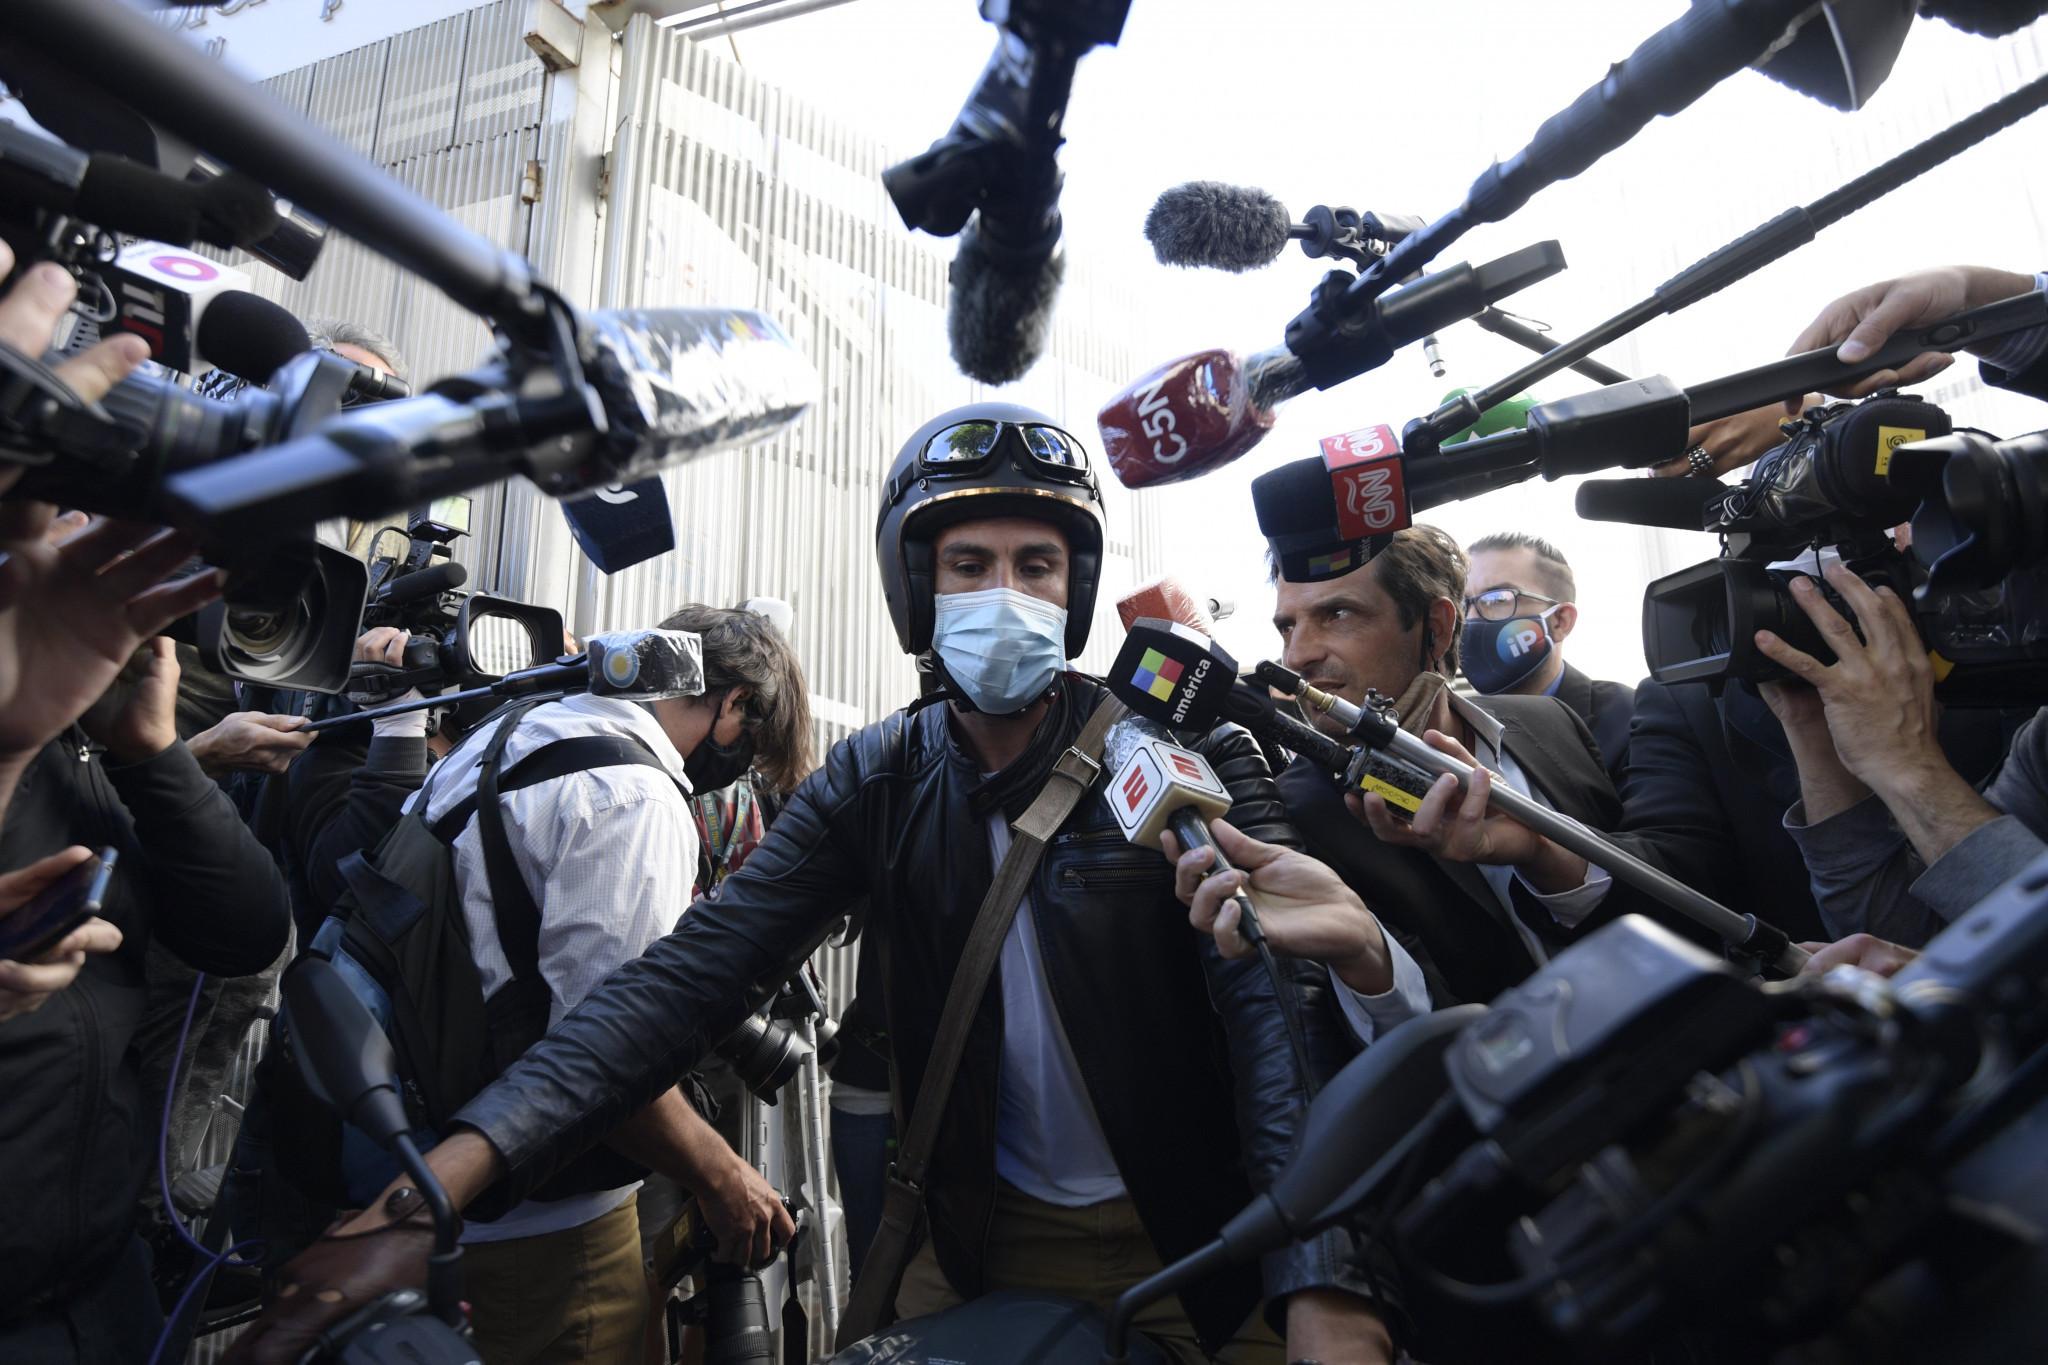 Doctor of Argentina's football legend Maradona investigated for possible manslaughter